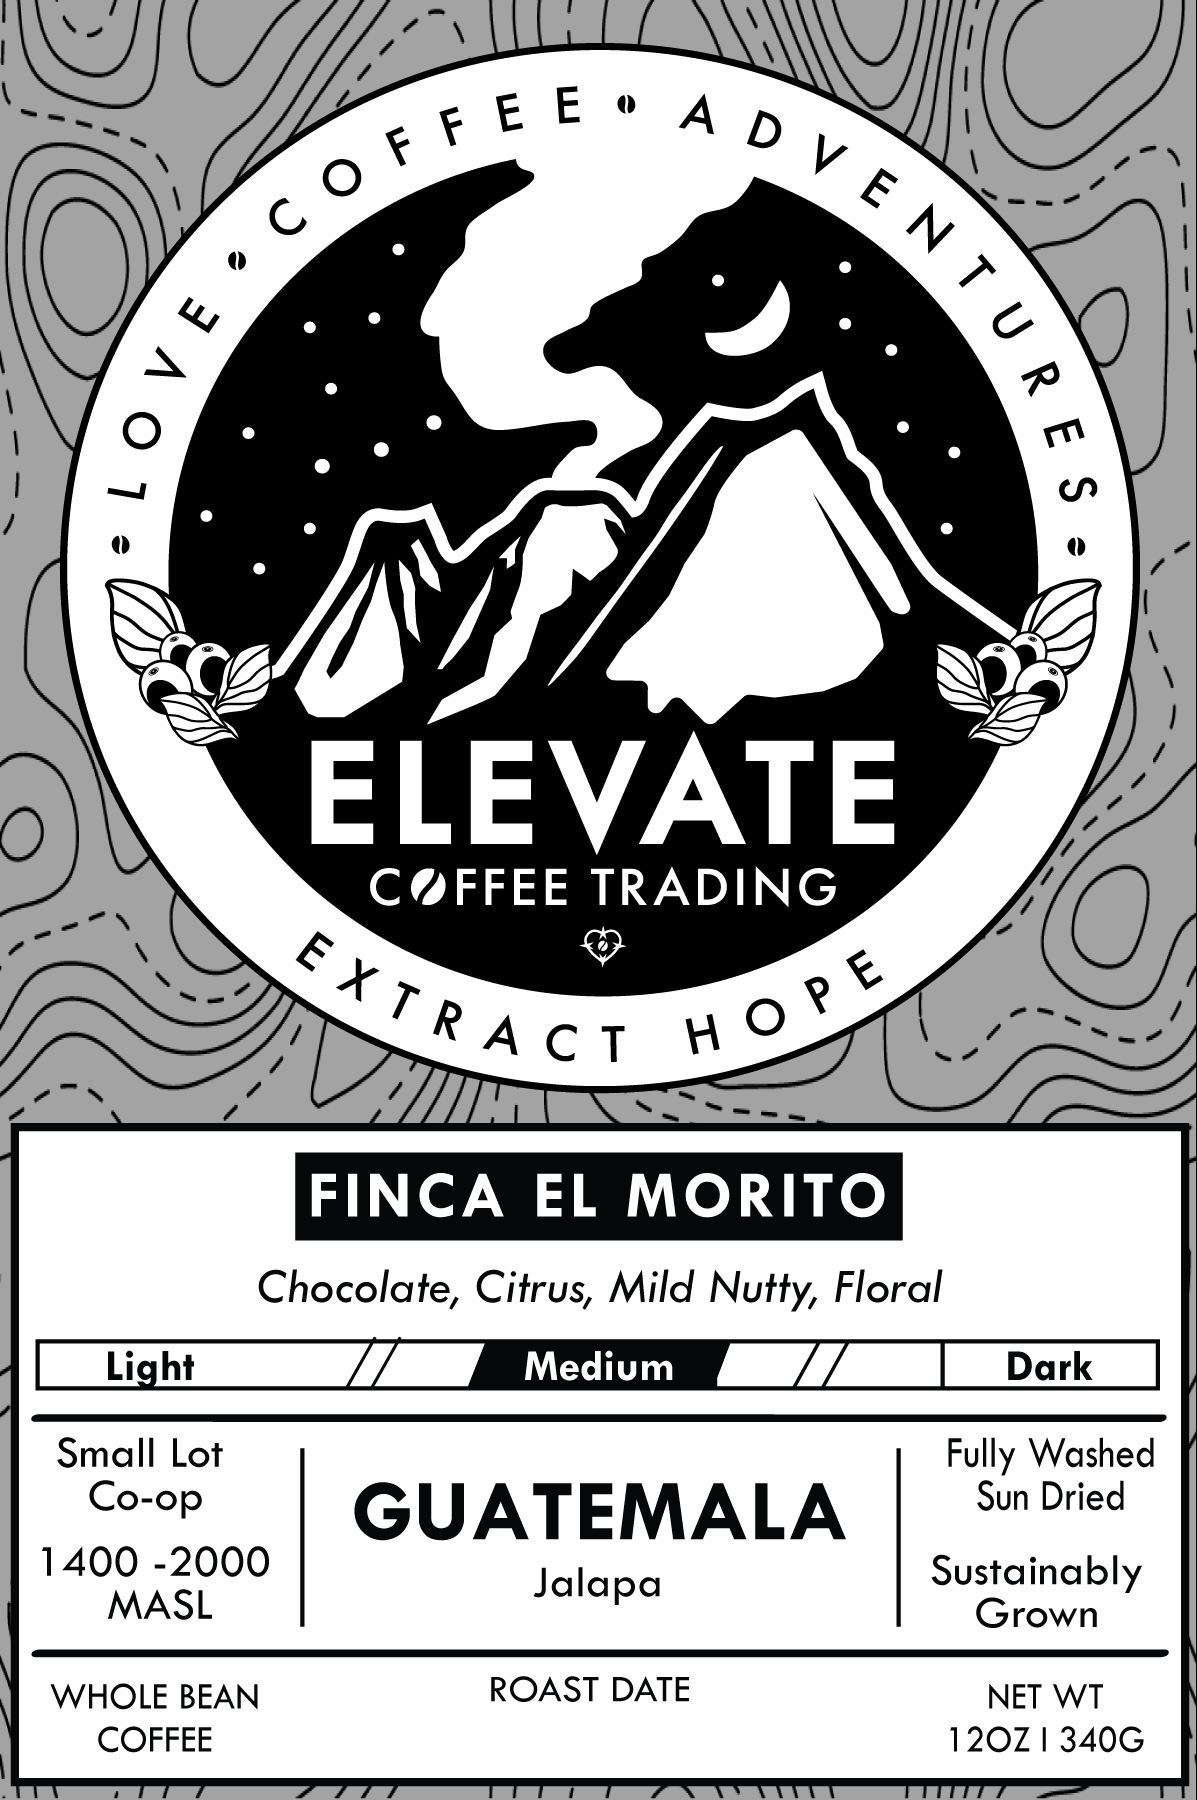 Guatemala - Medium Roast from Elevate Coffee Trading